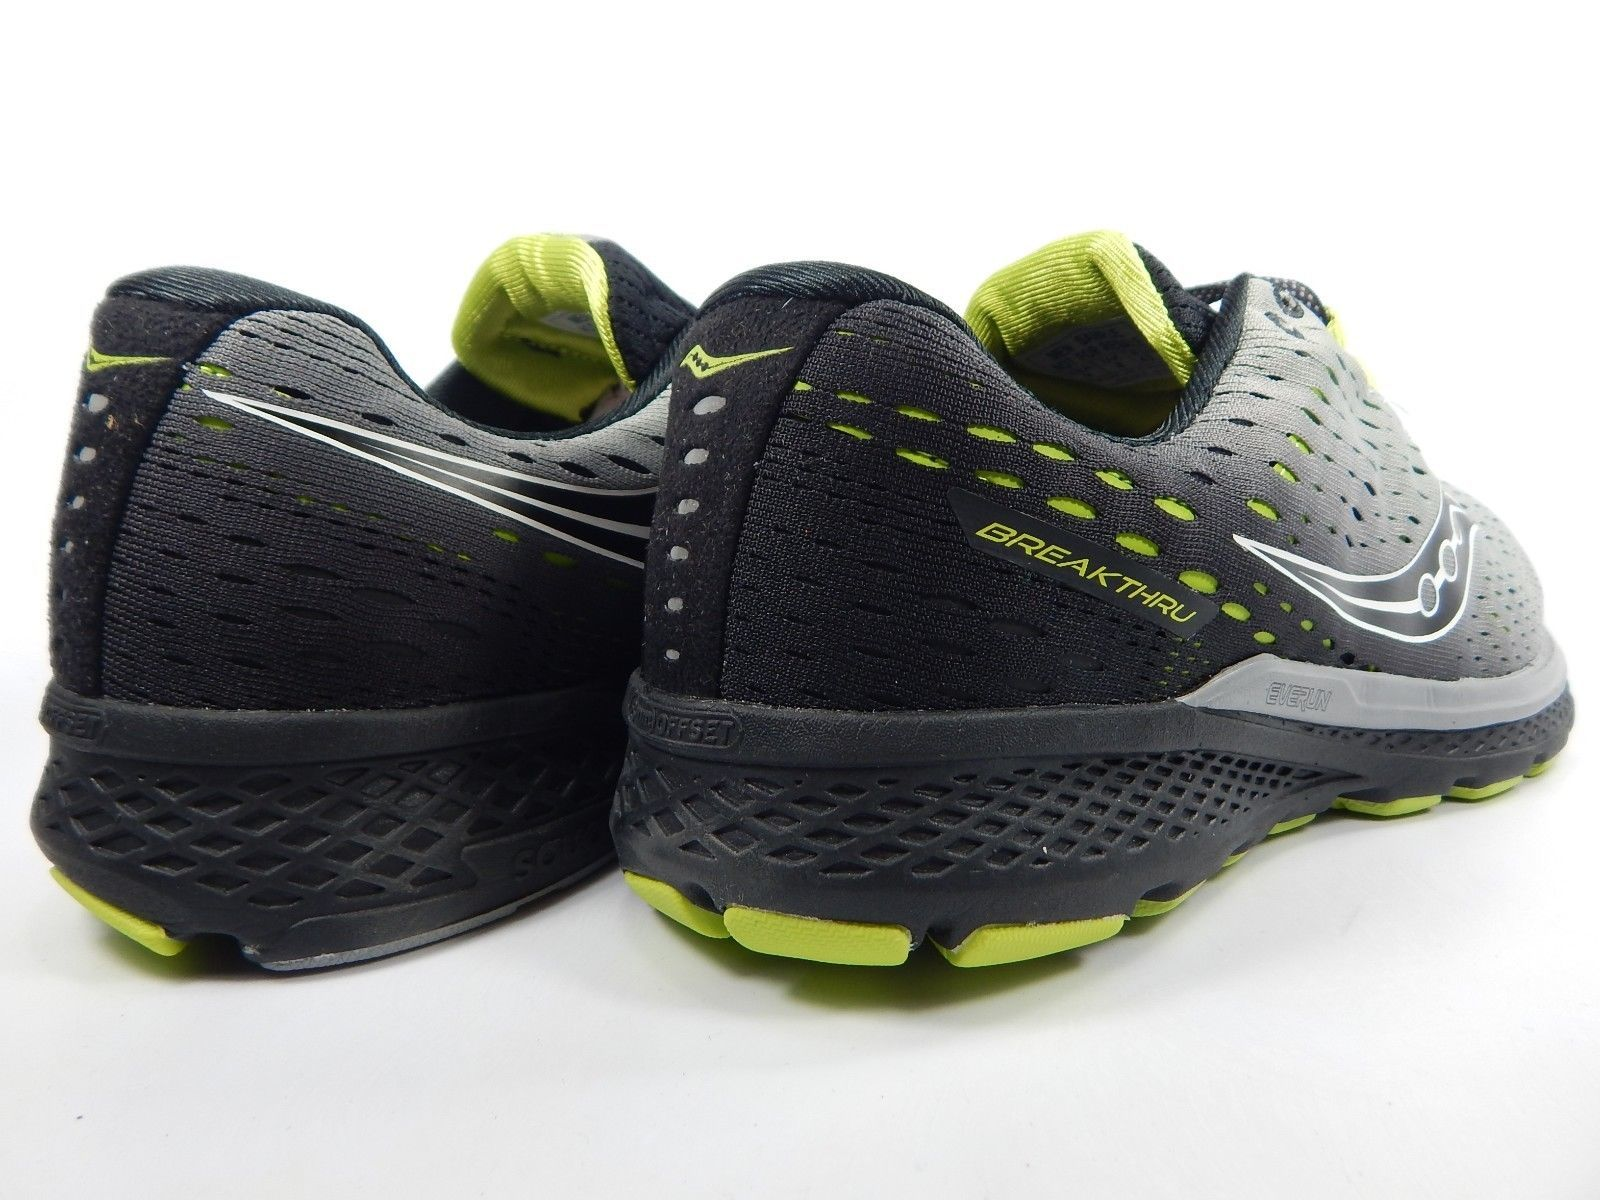 1ed41b816794 Saucony Breakthru 3 Men s Running Shoes Size US 9 M (D) EU 42.5 Grey